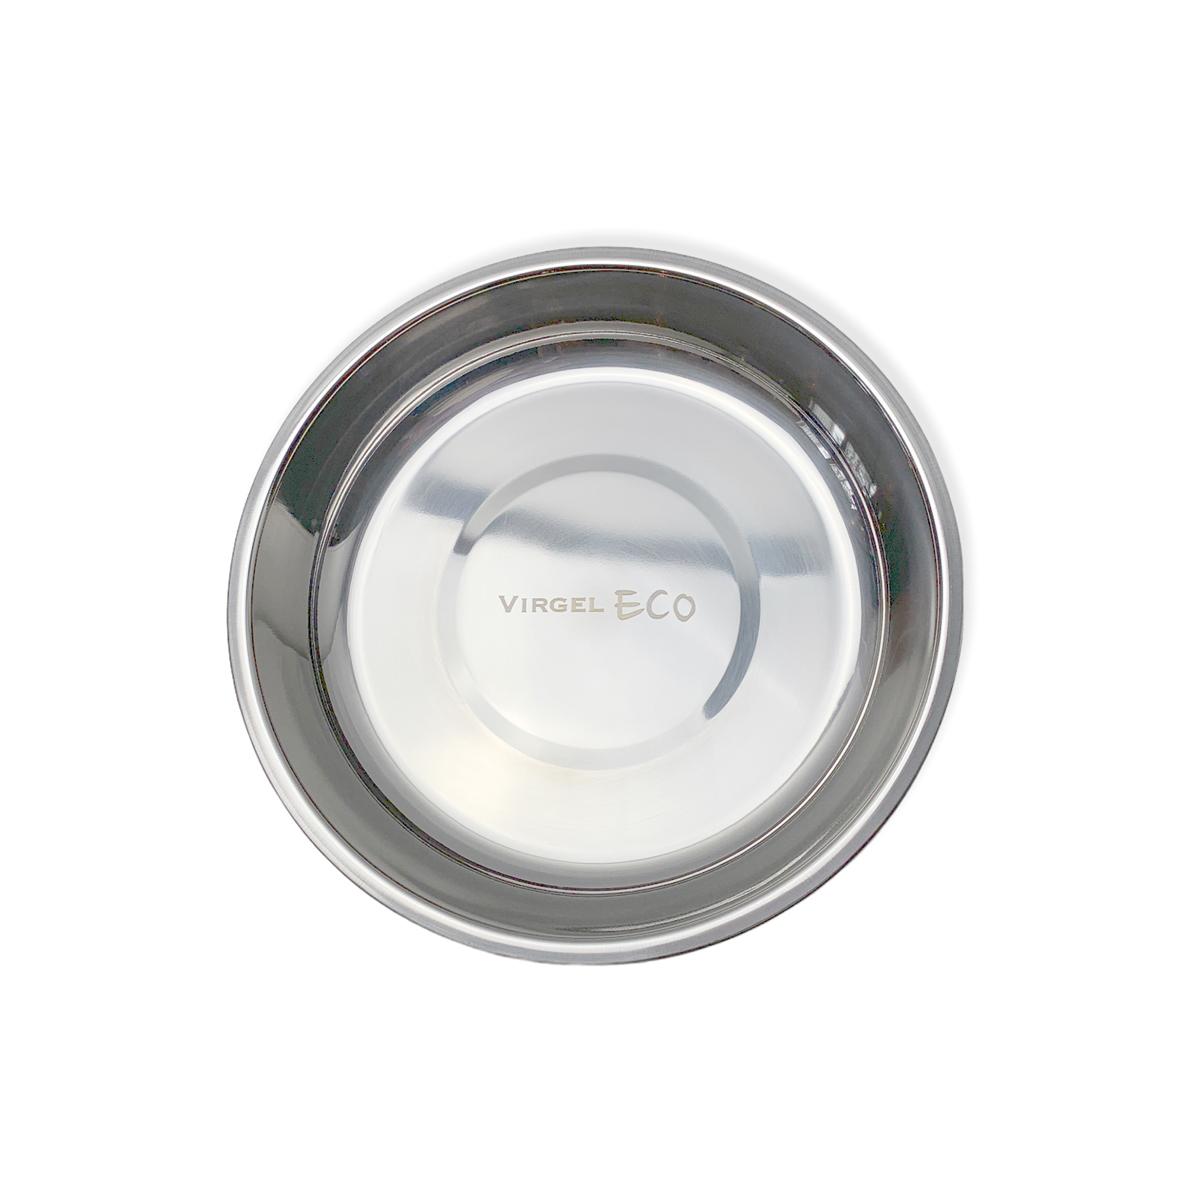 Tallrik av rostfritt stål 18/8, 14 cm i diameter, hög kant perfekt barntallrik, Virgel